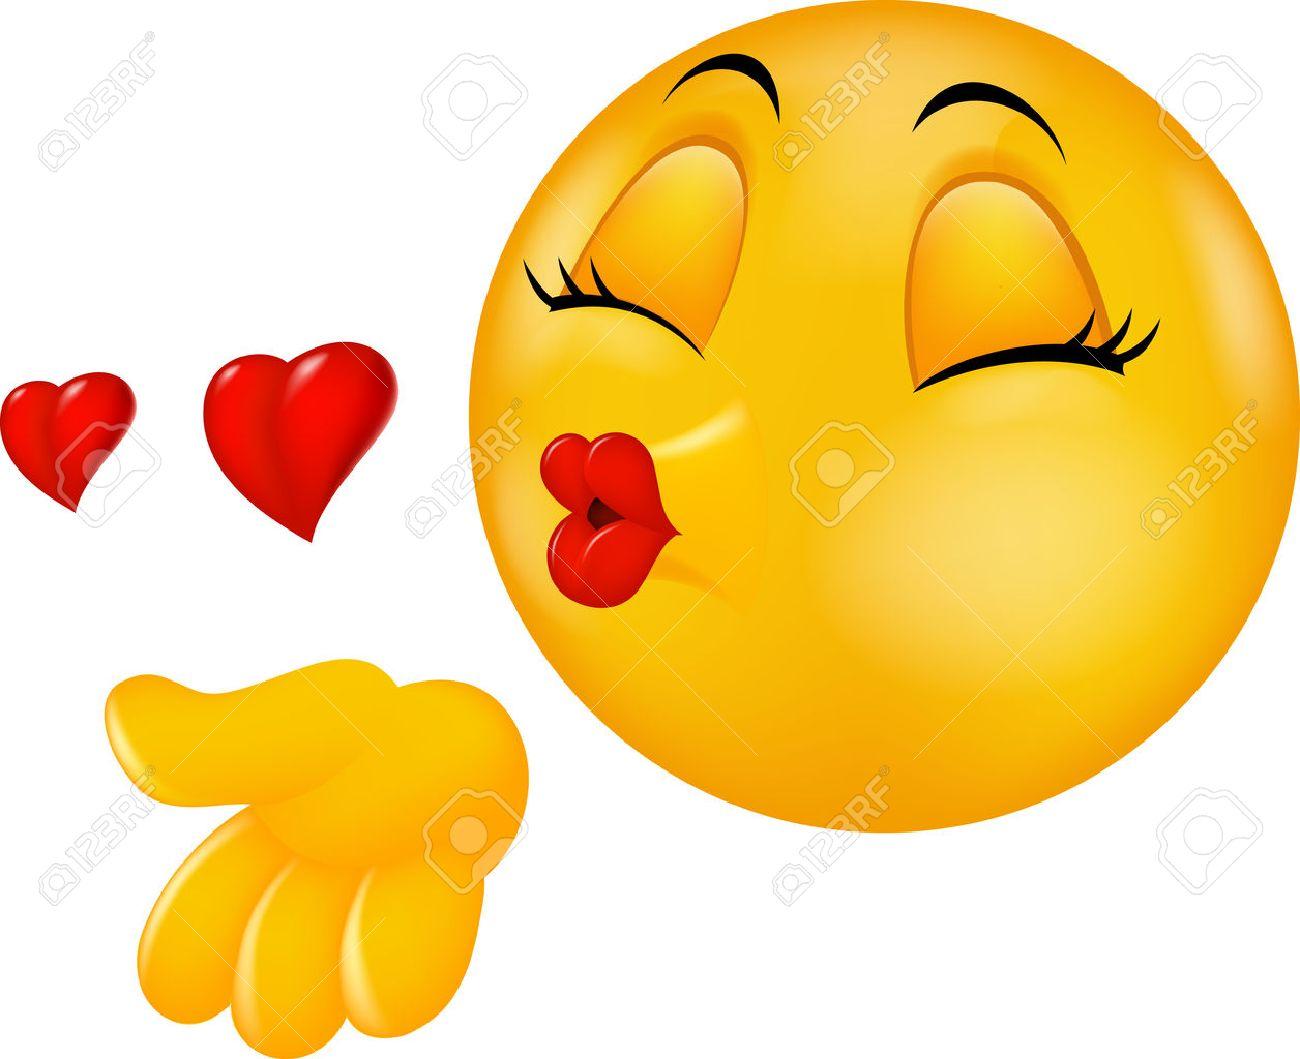 поцелуйчики смайлики картинки